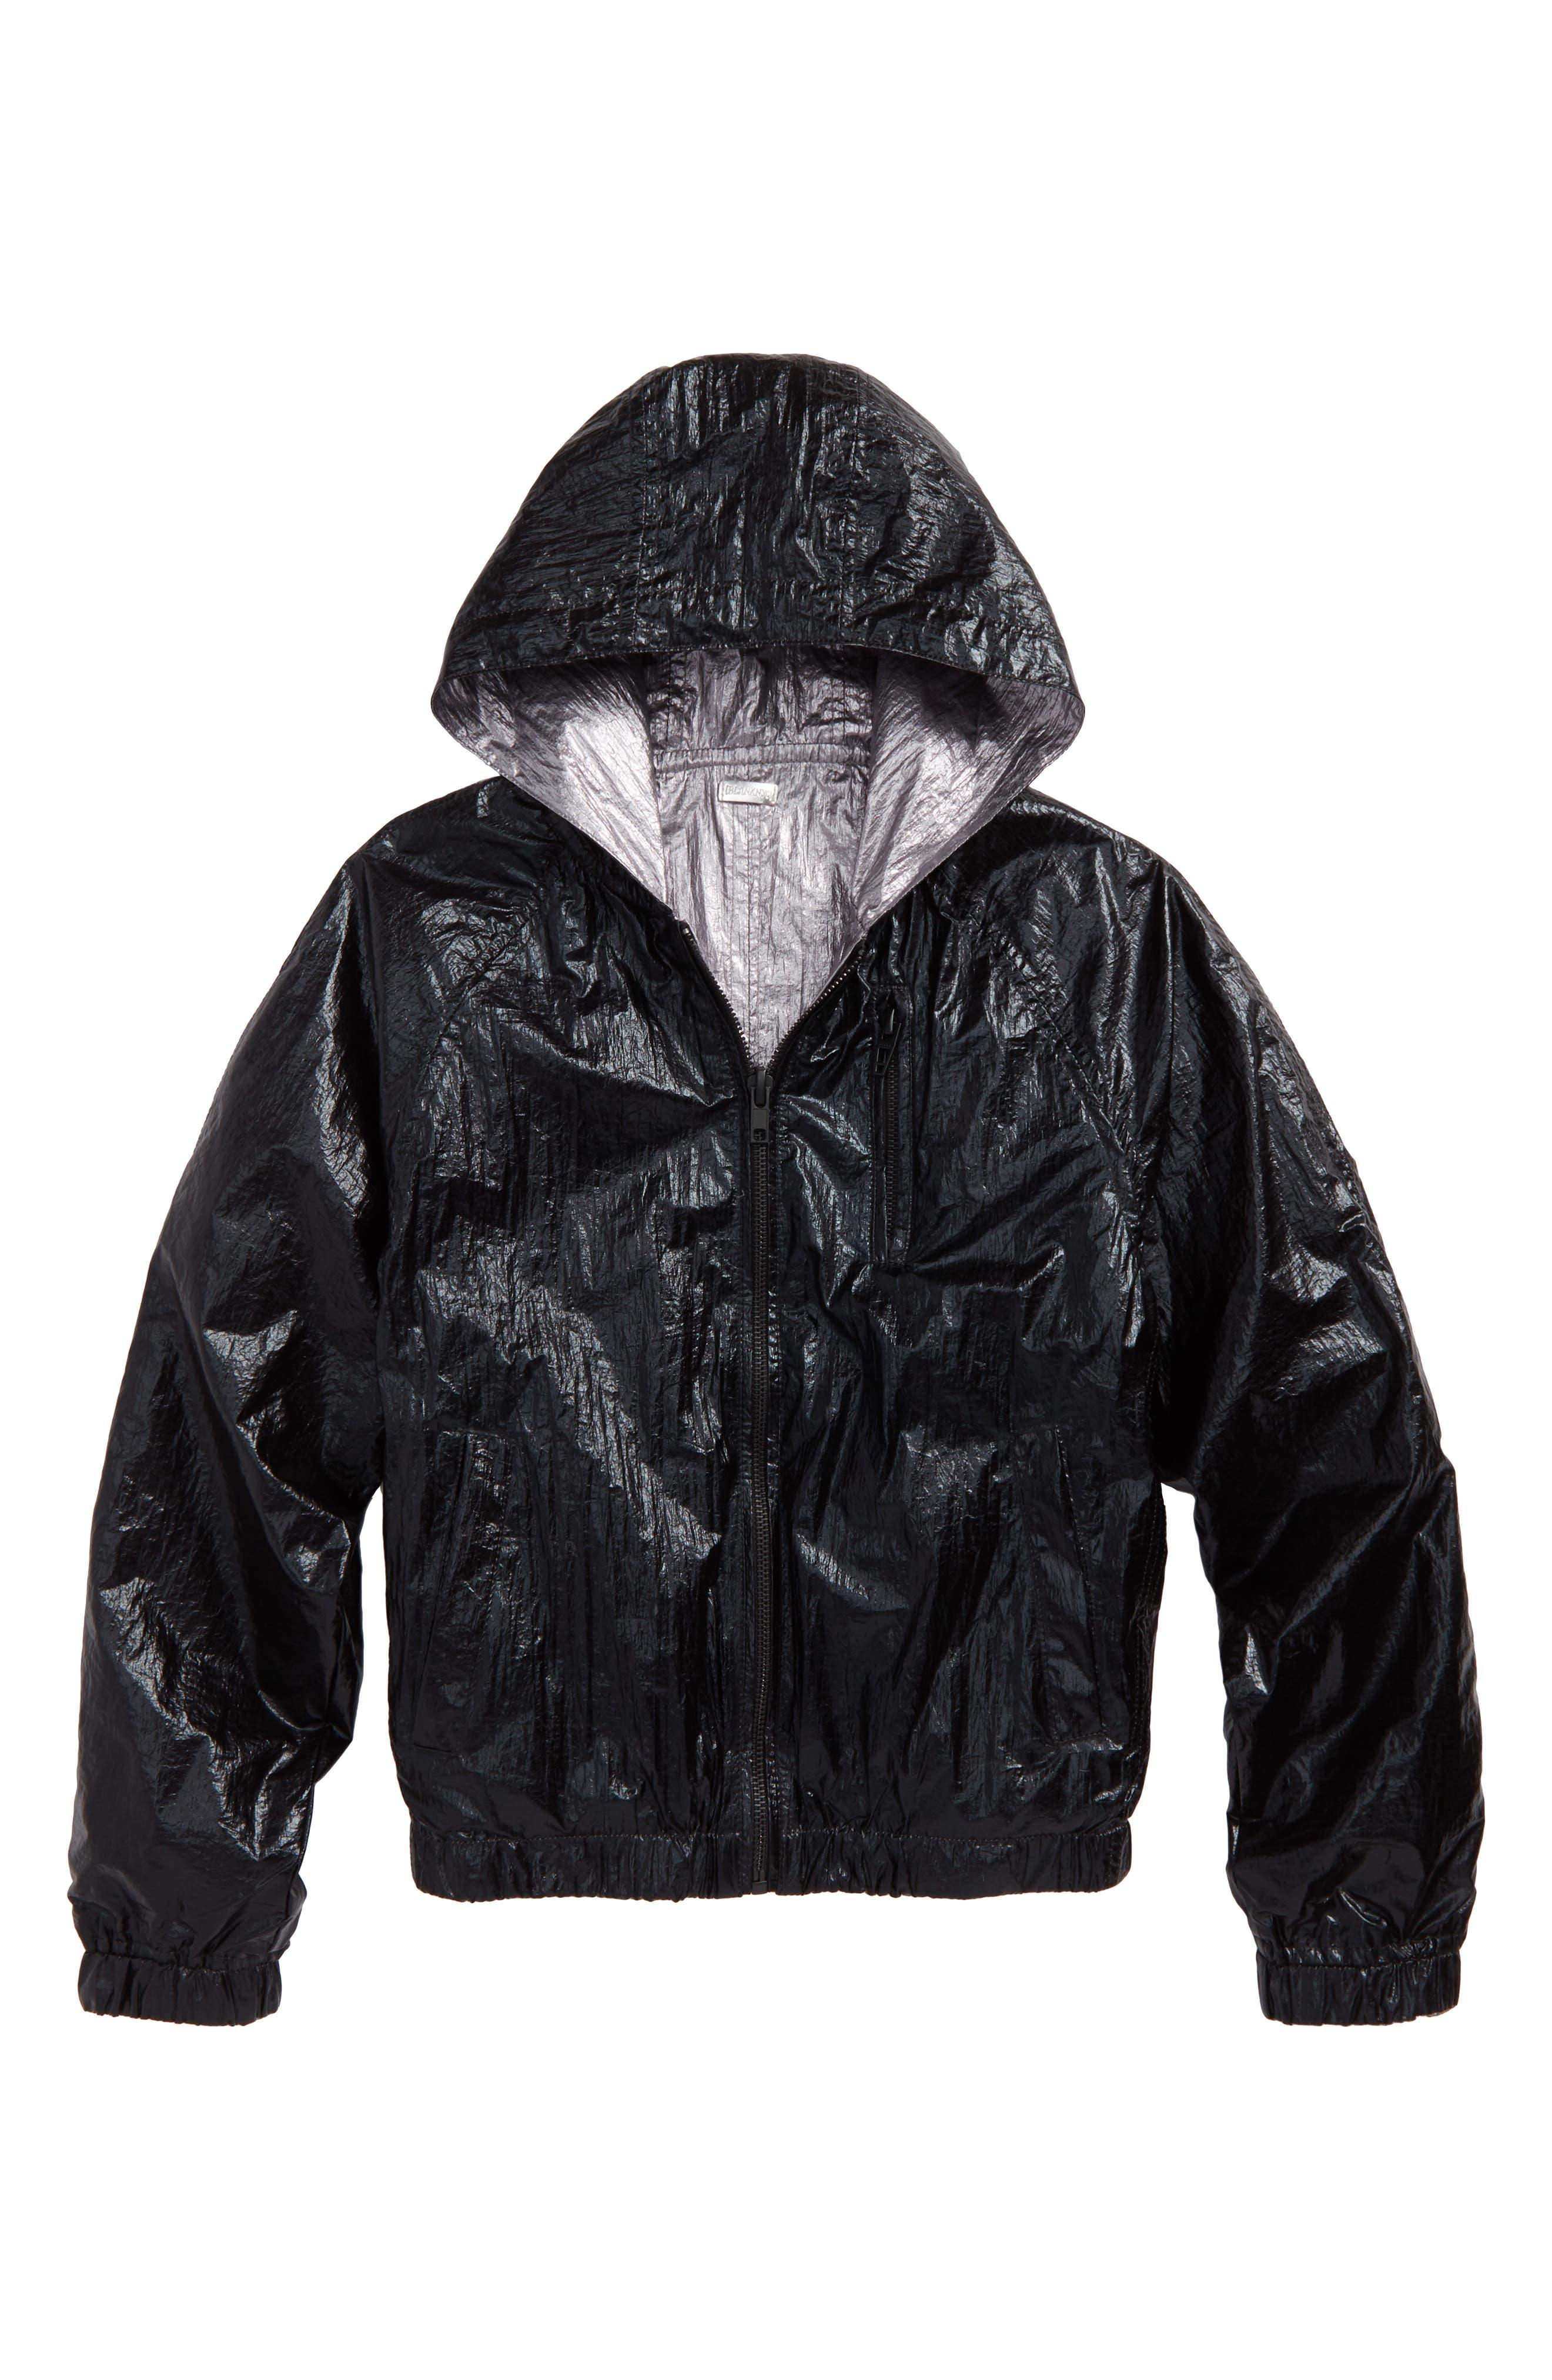 BLANCNYC Good Vibrations Reversible Hooded Jacket,                         Main,                         color, Black/ Silver